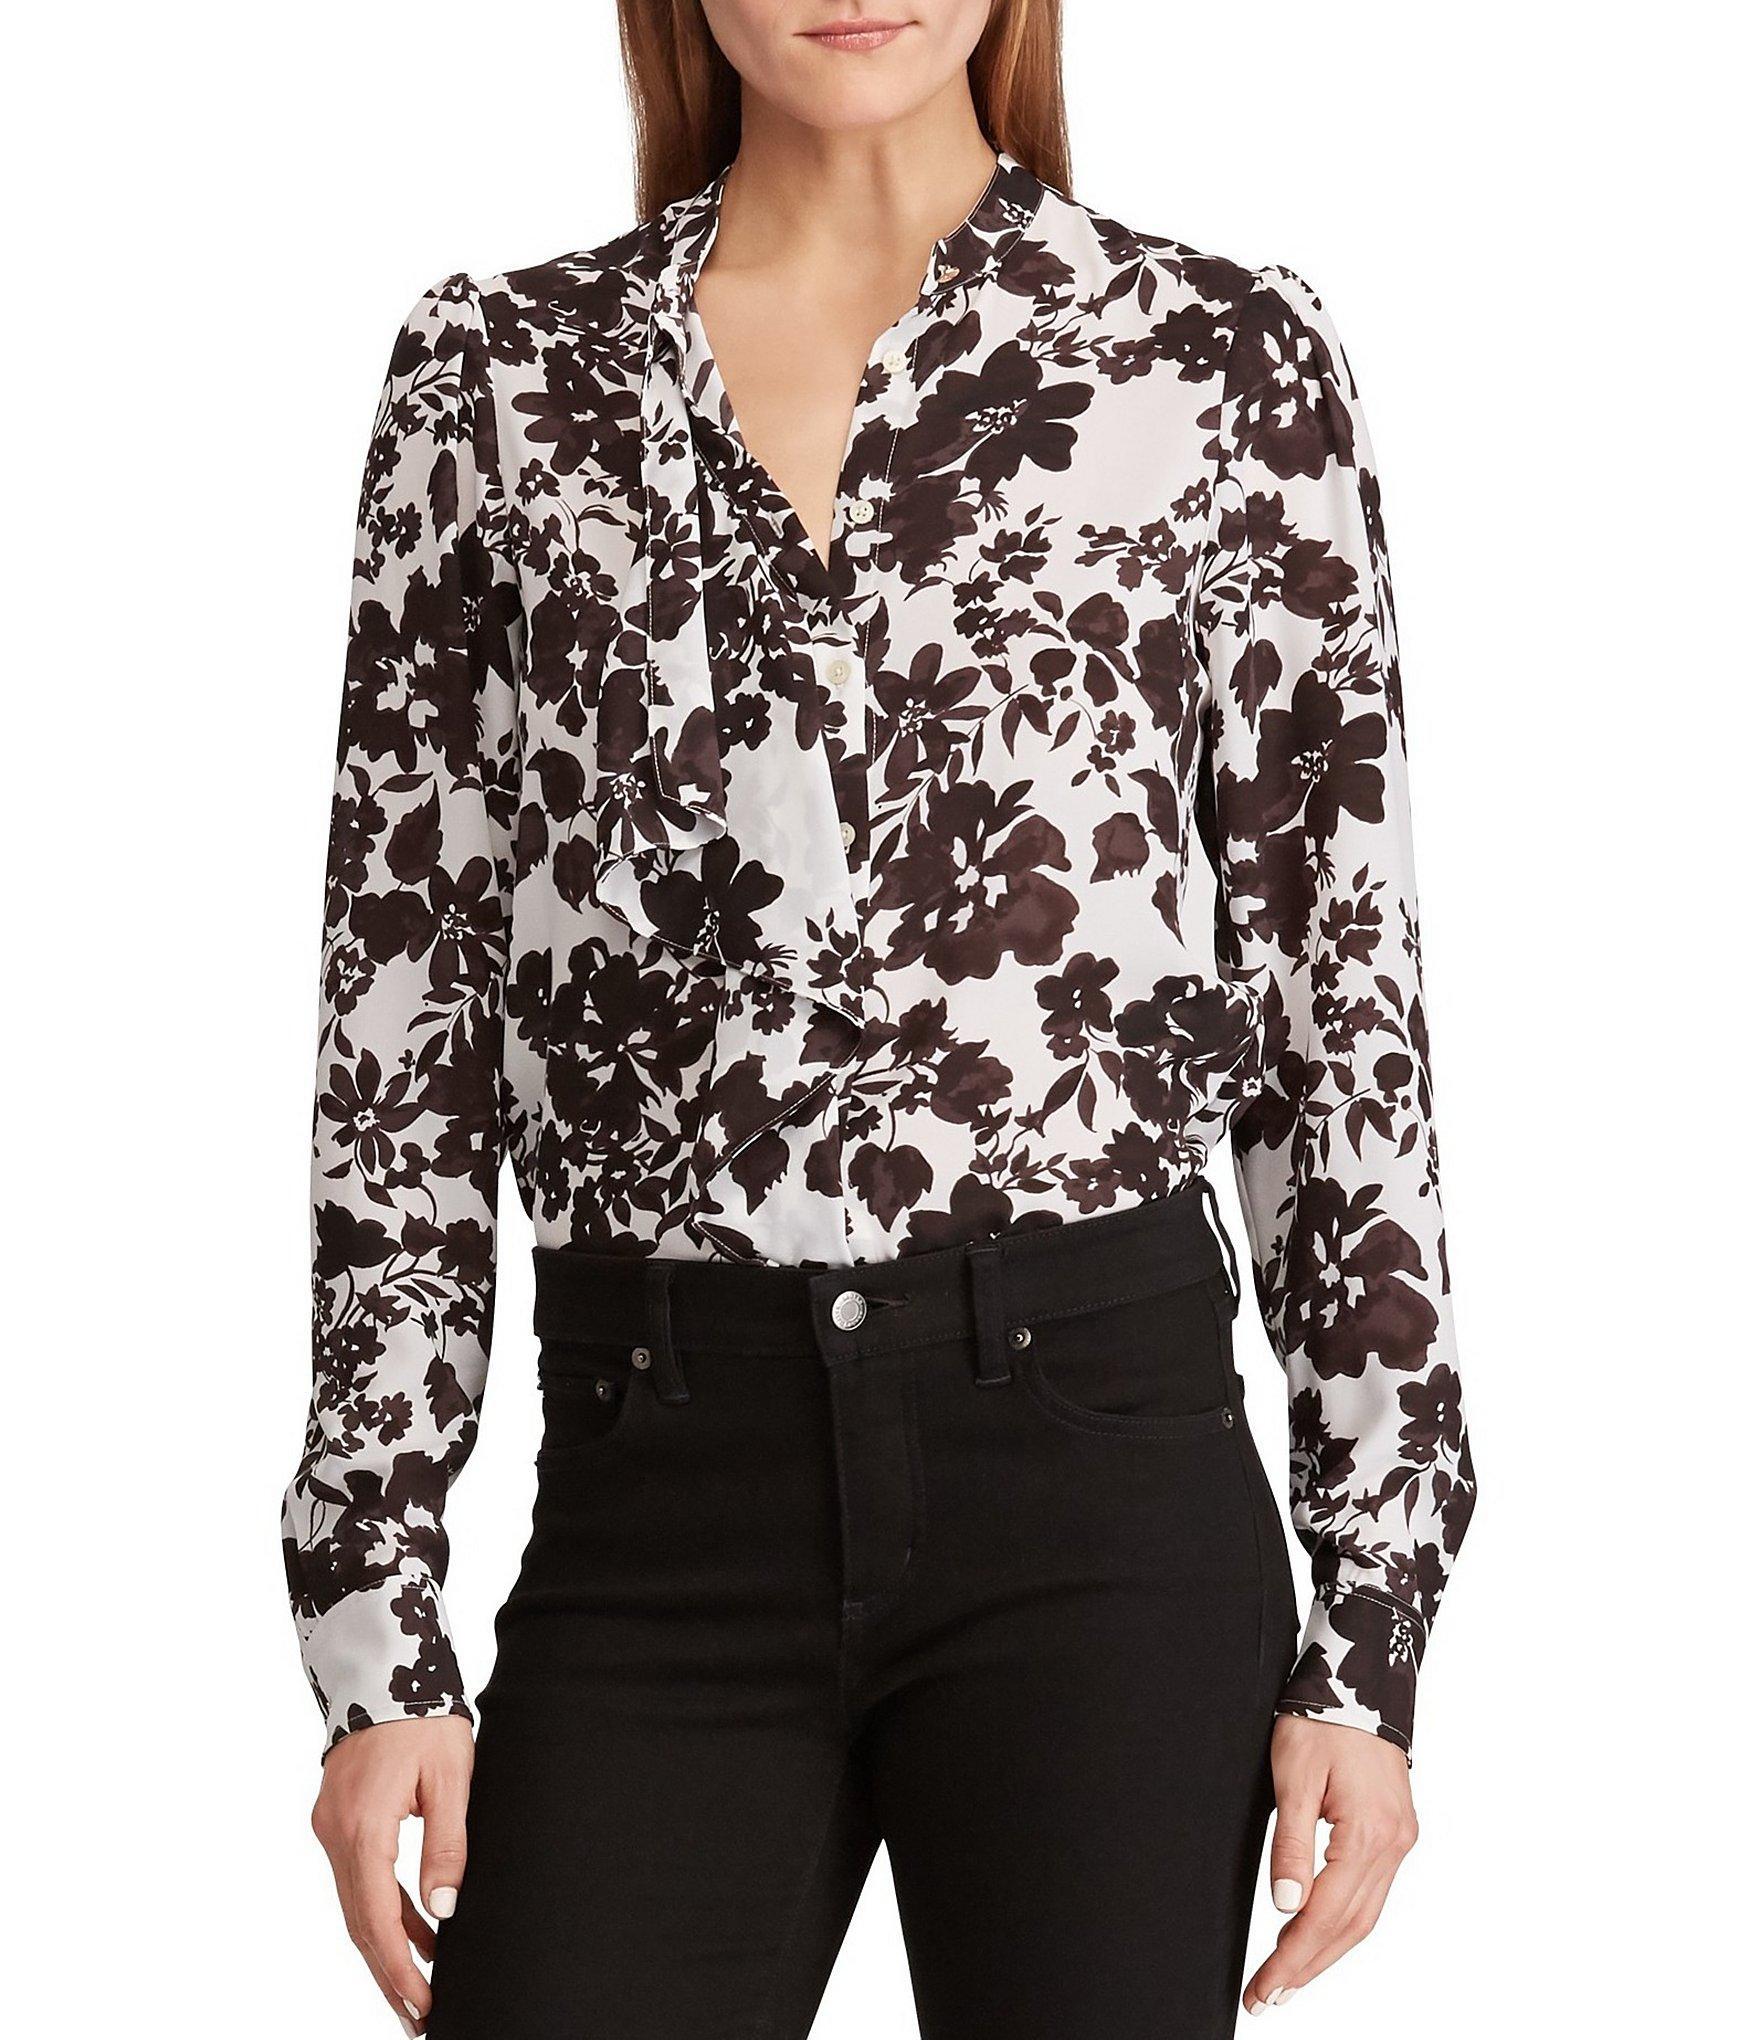 ef58e2718855dd Lauren by Ralph Lauren. Women's Black Ruffled Floral Print Button Front  Georgette Shirt